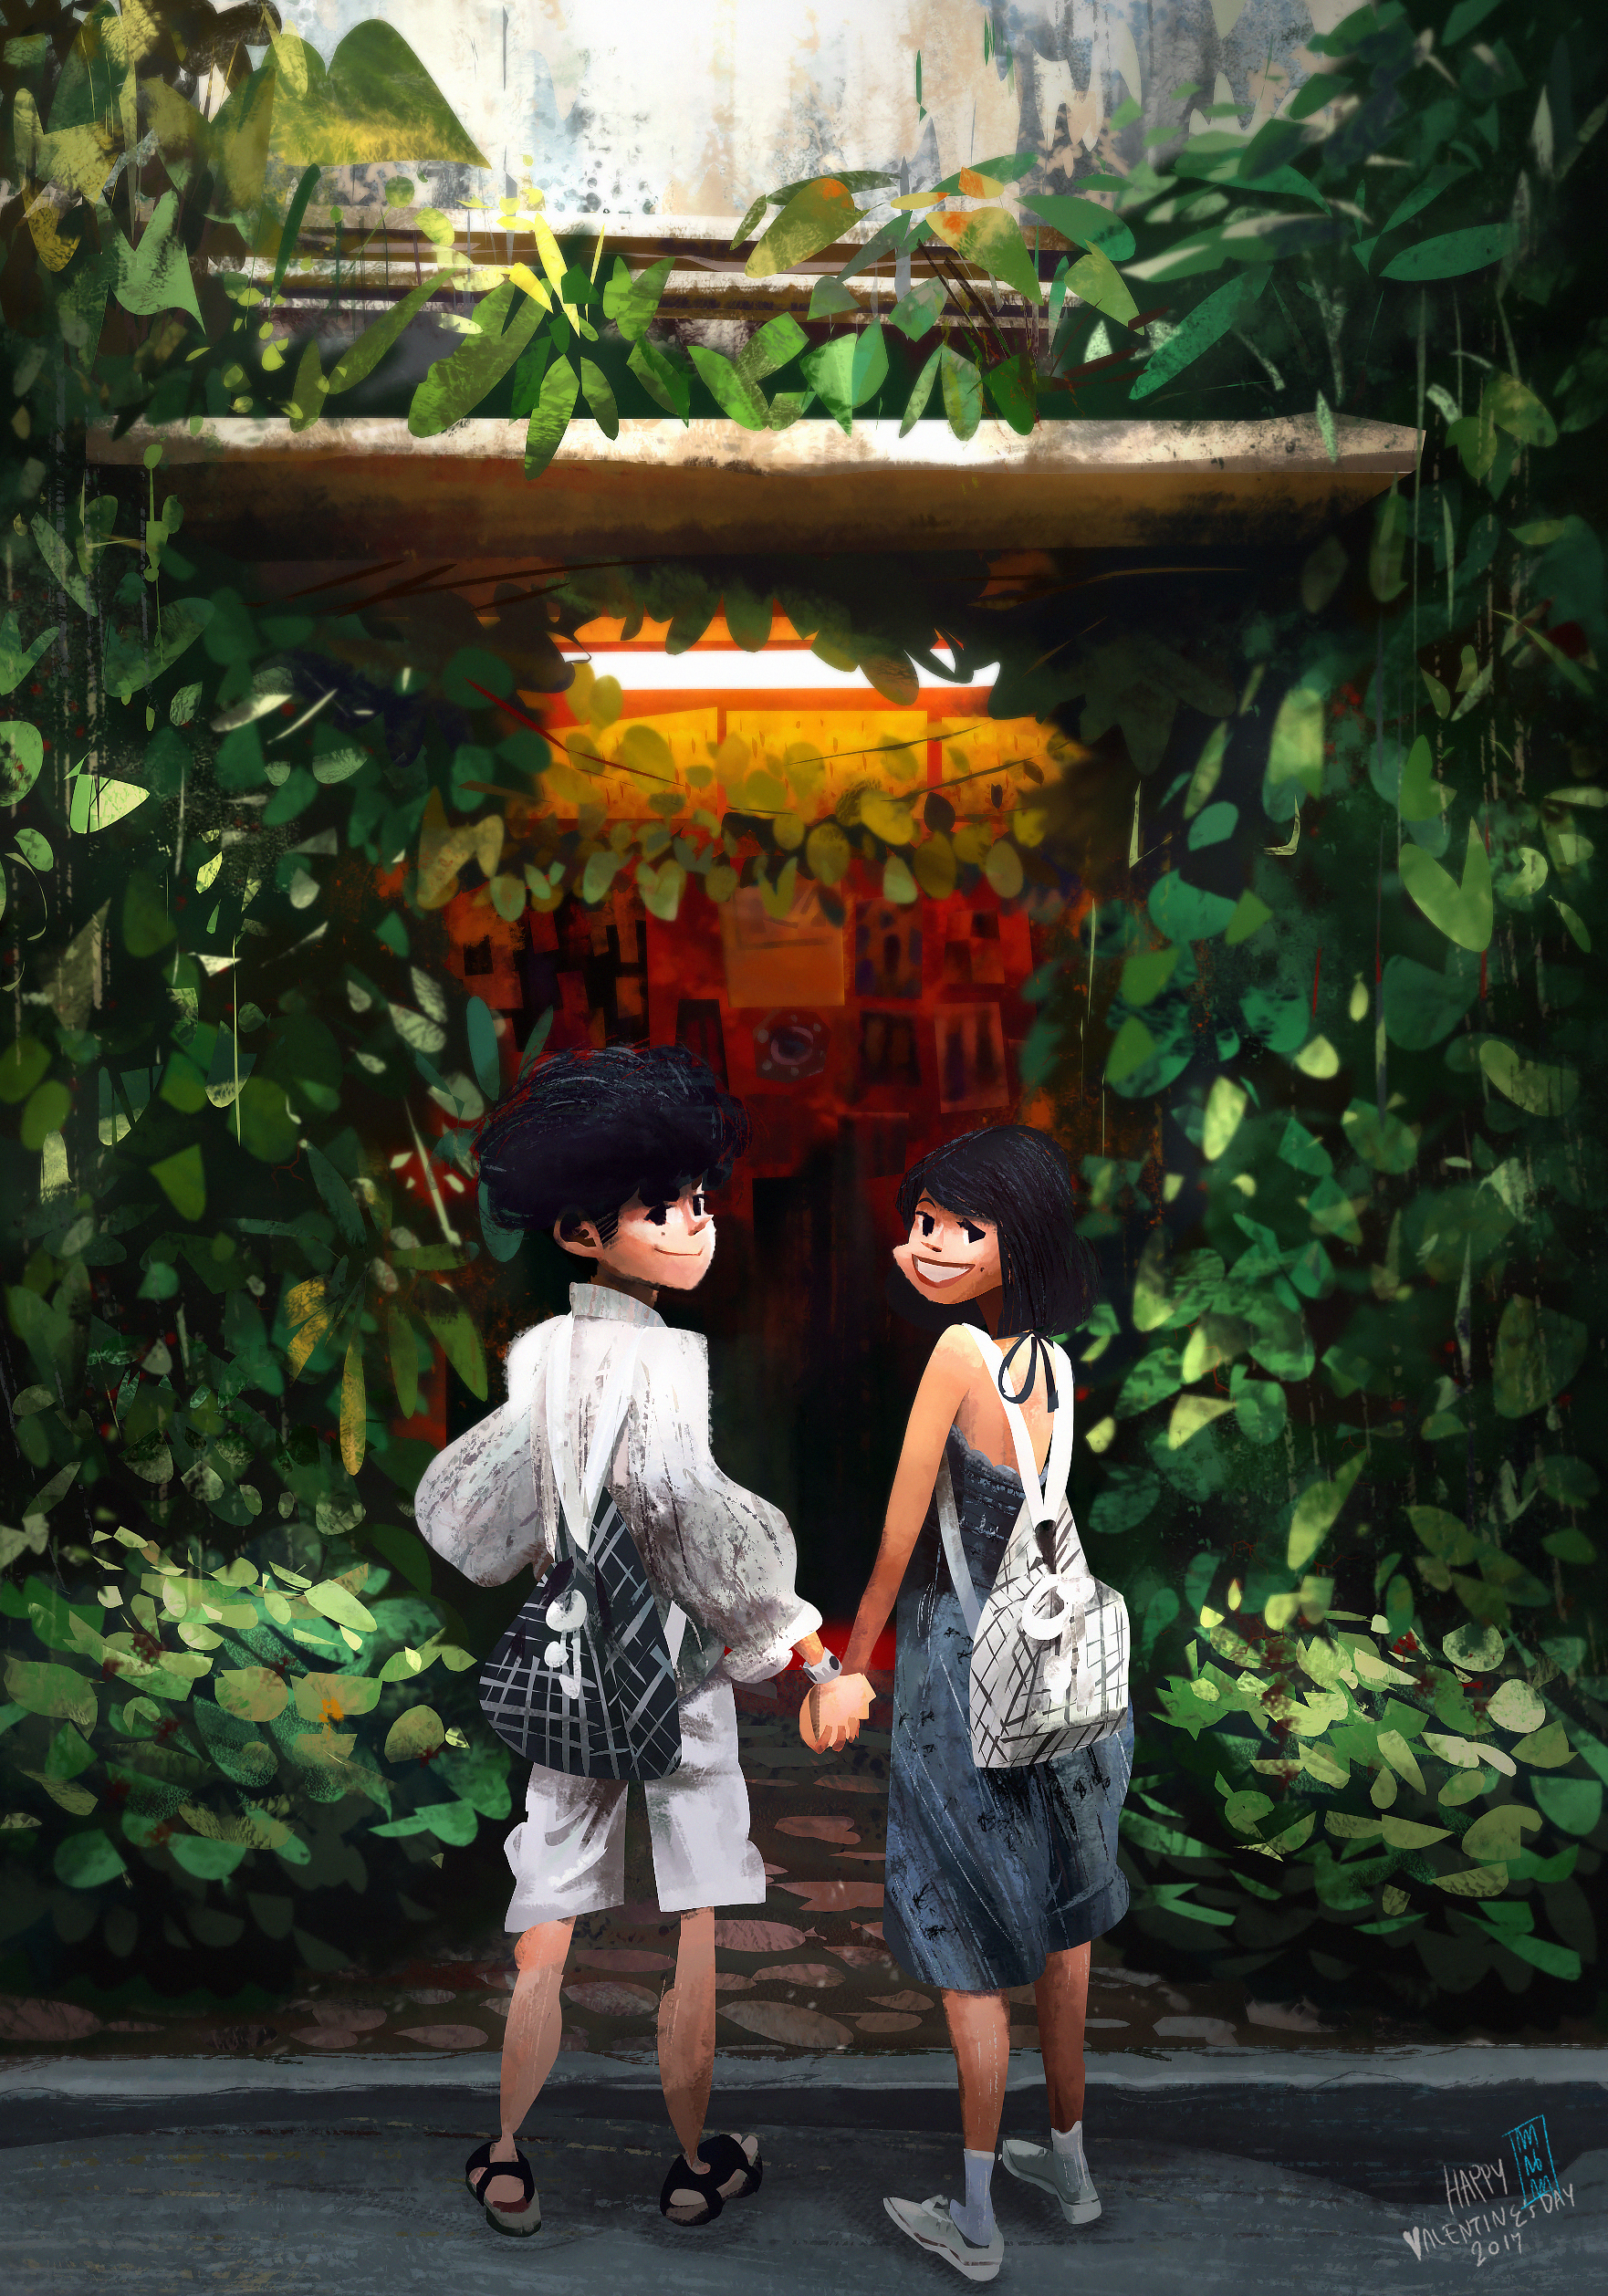 Stylish Artworks by Tanta Vorawatanakul